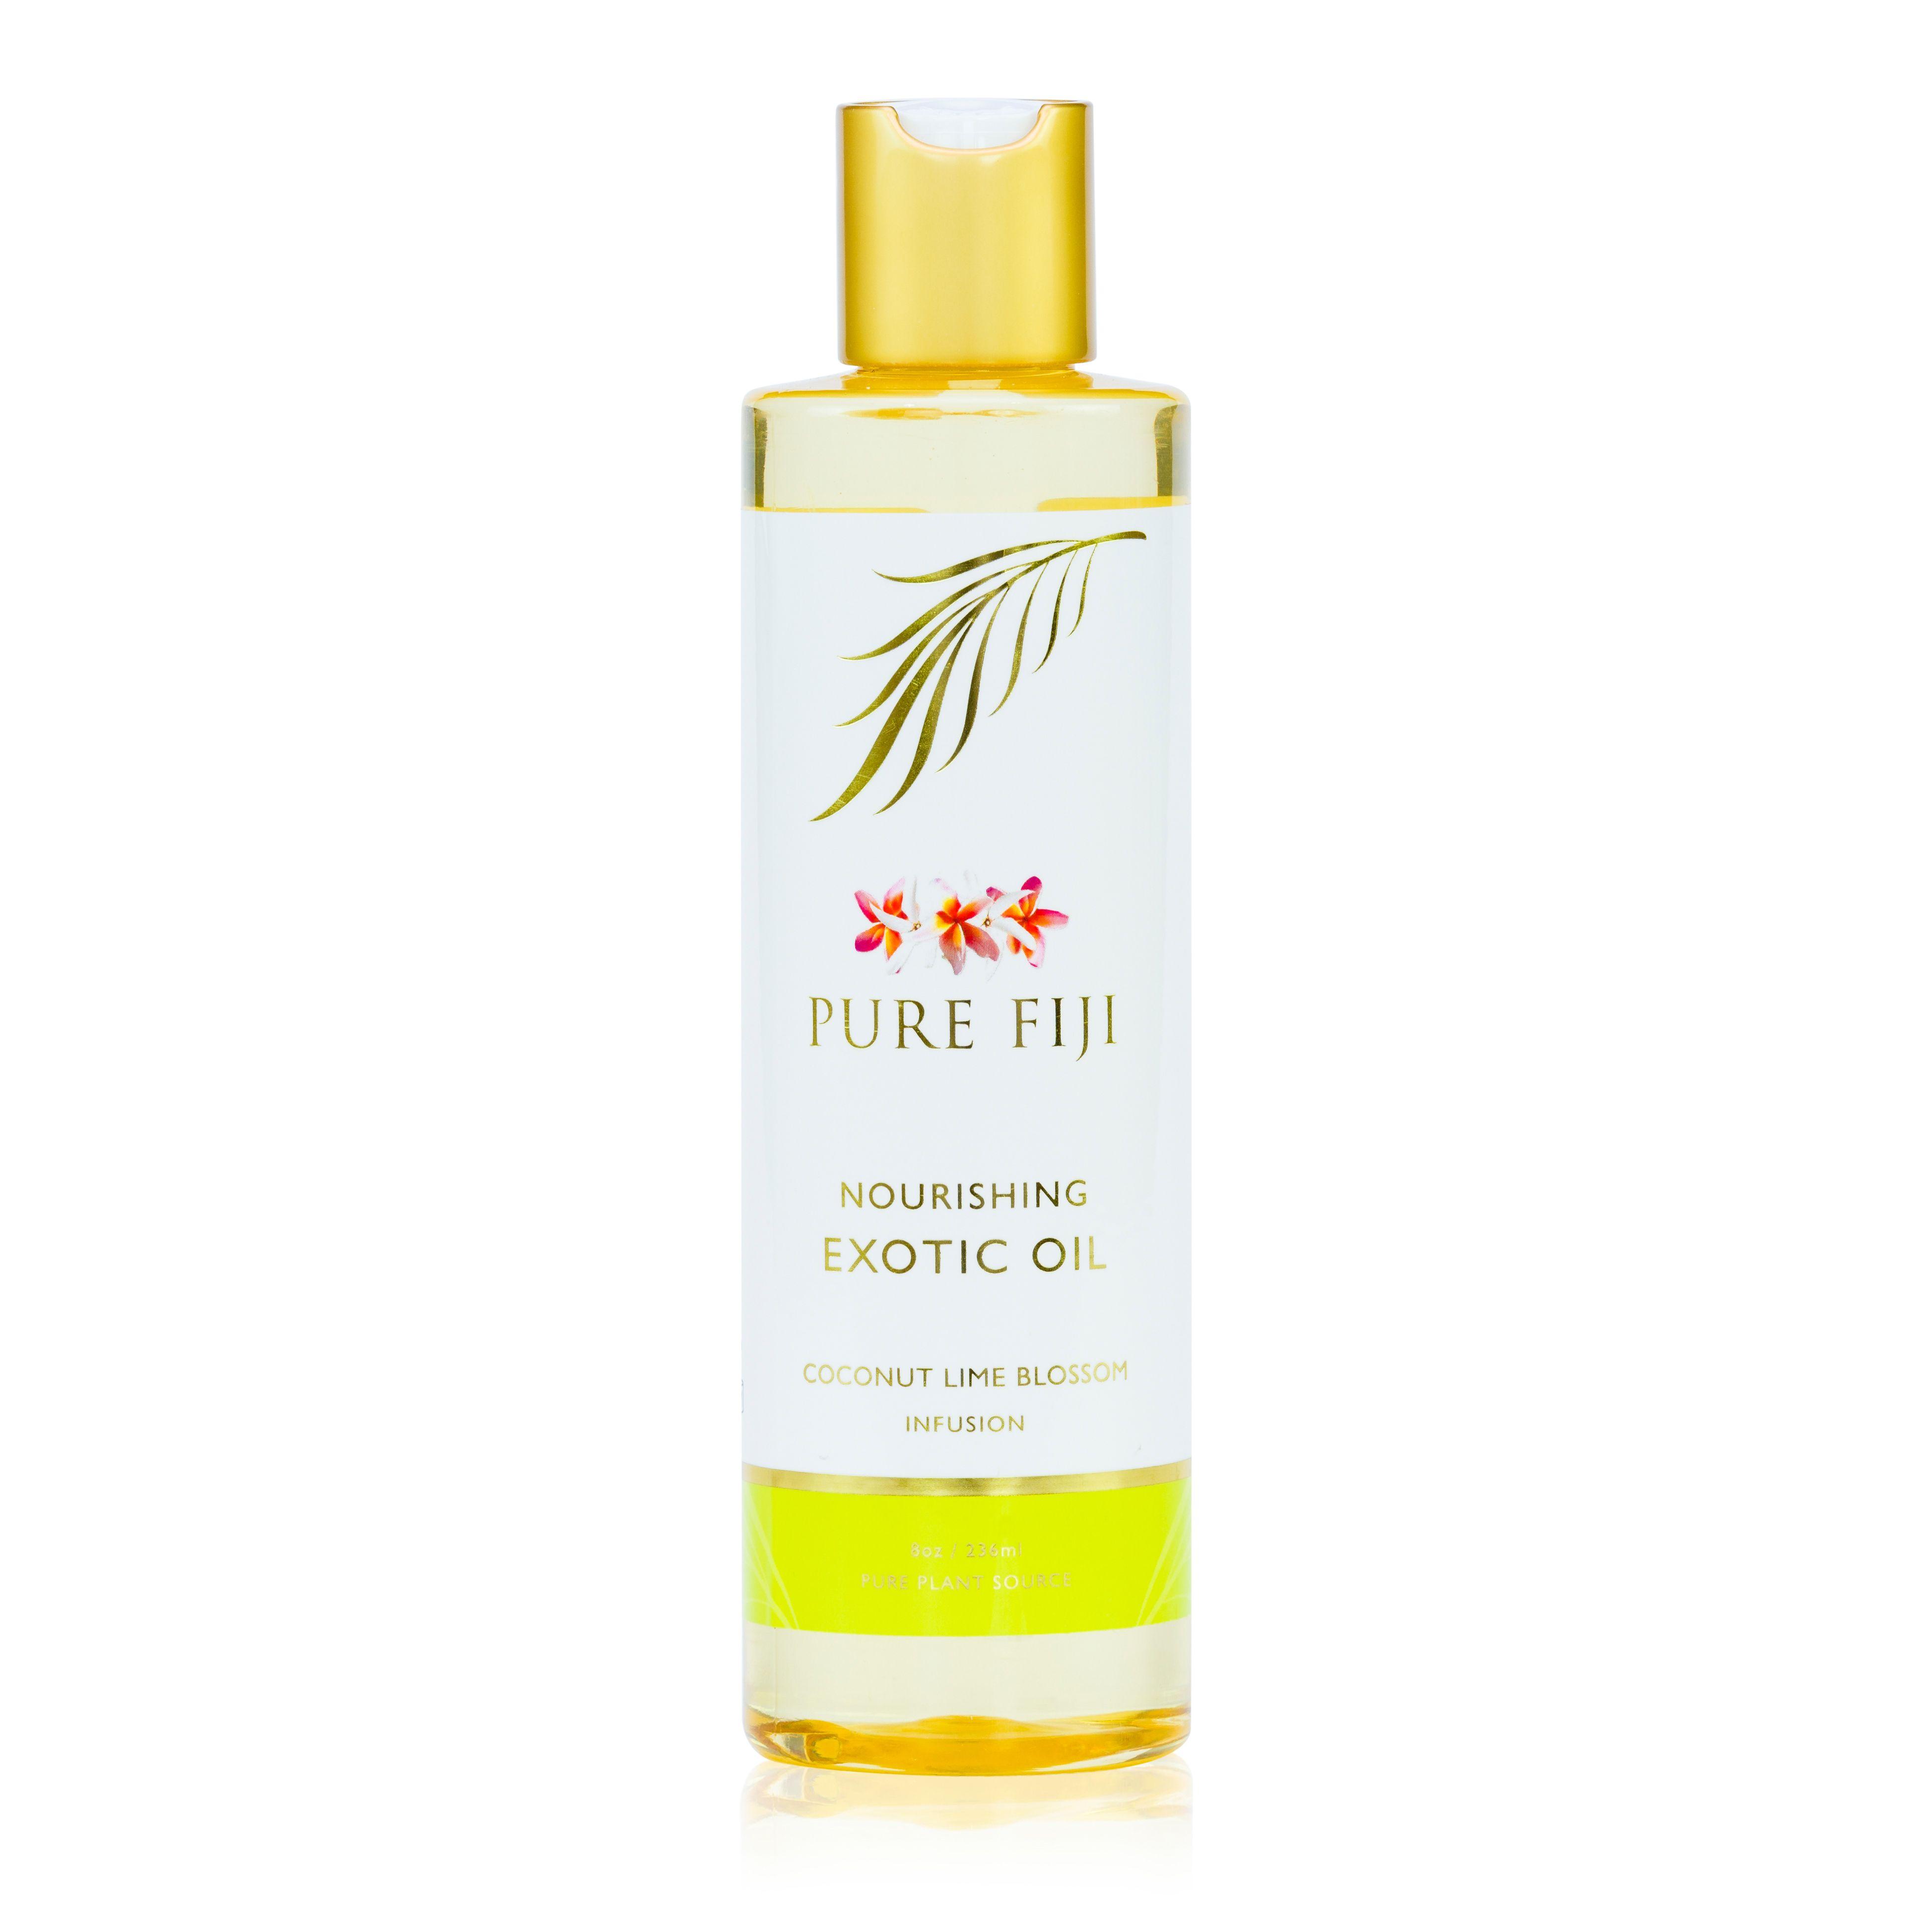 Nourishing Exotic Oil